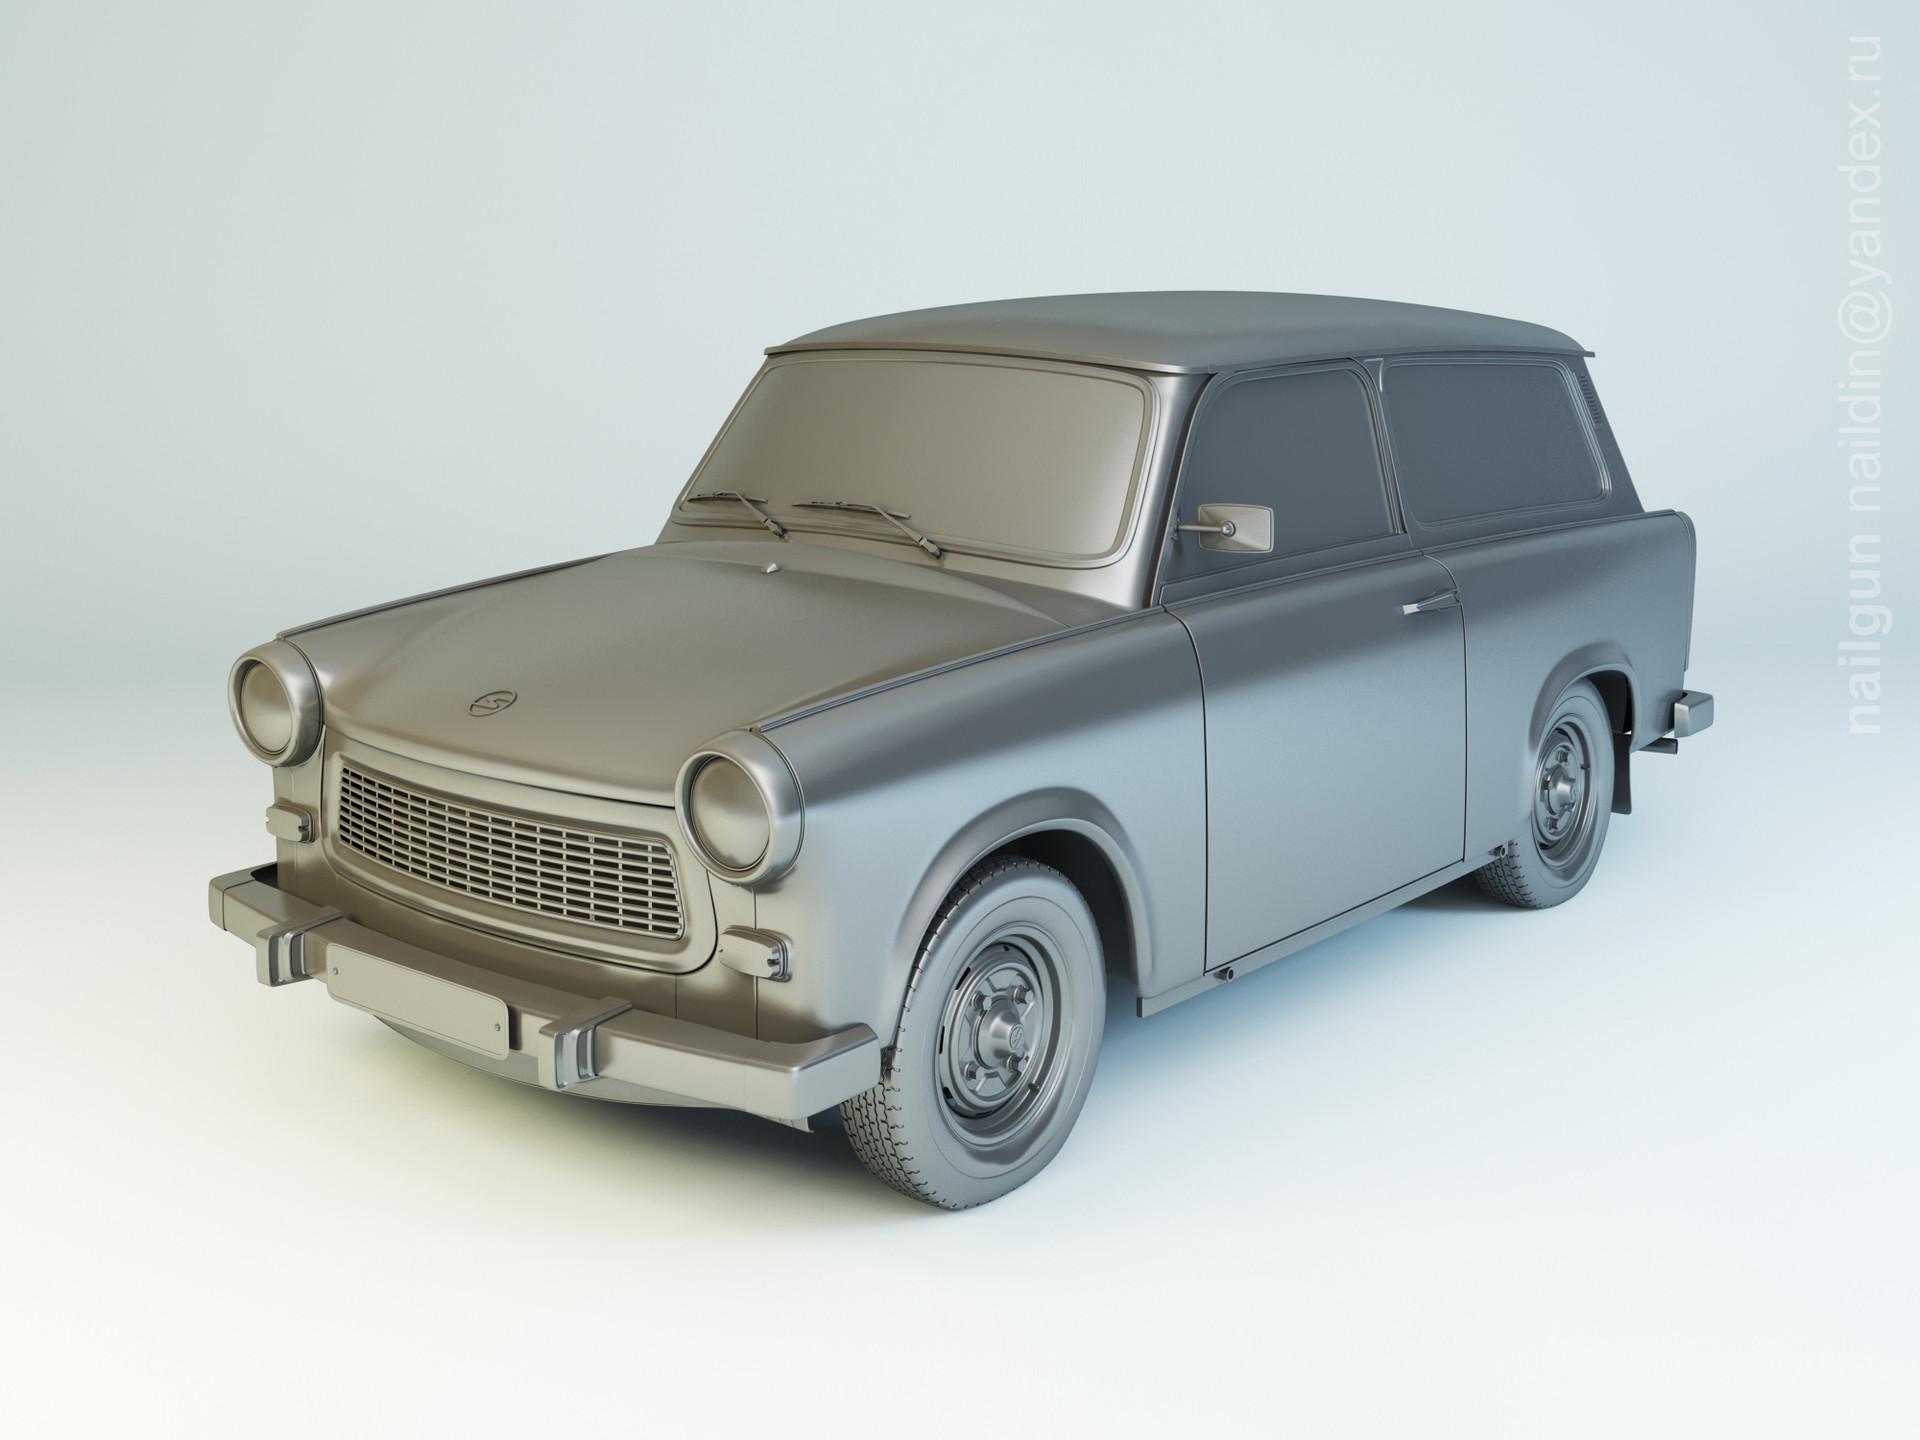 Nail khusnutdinov pwc 023 004 trabant 601 combi modelling 0